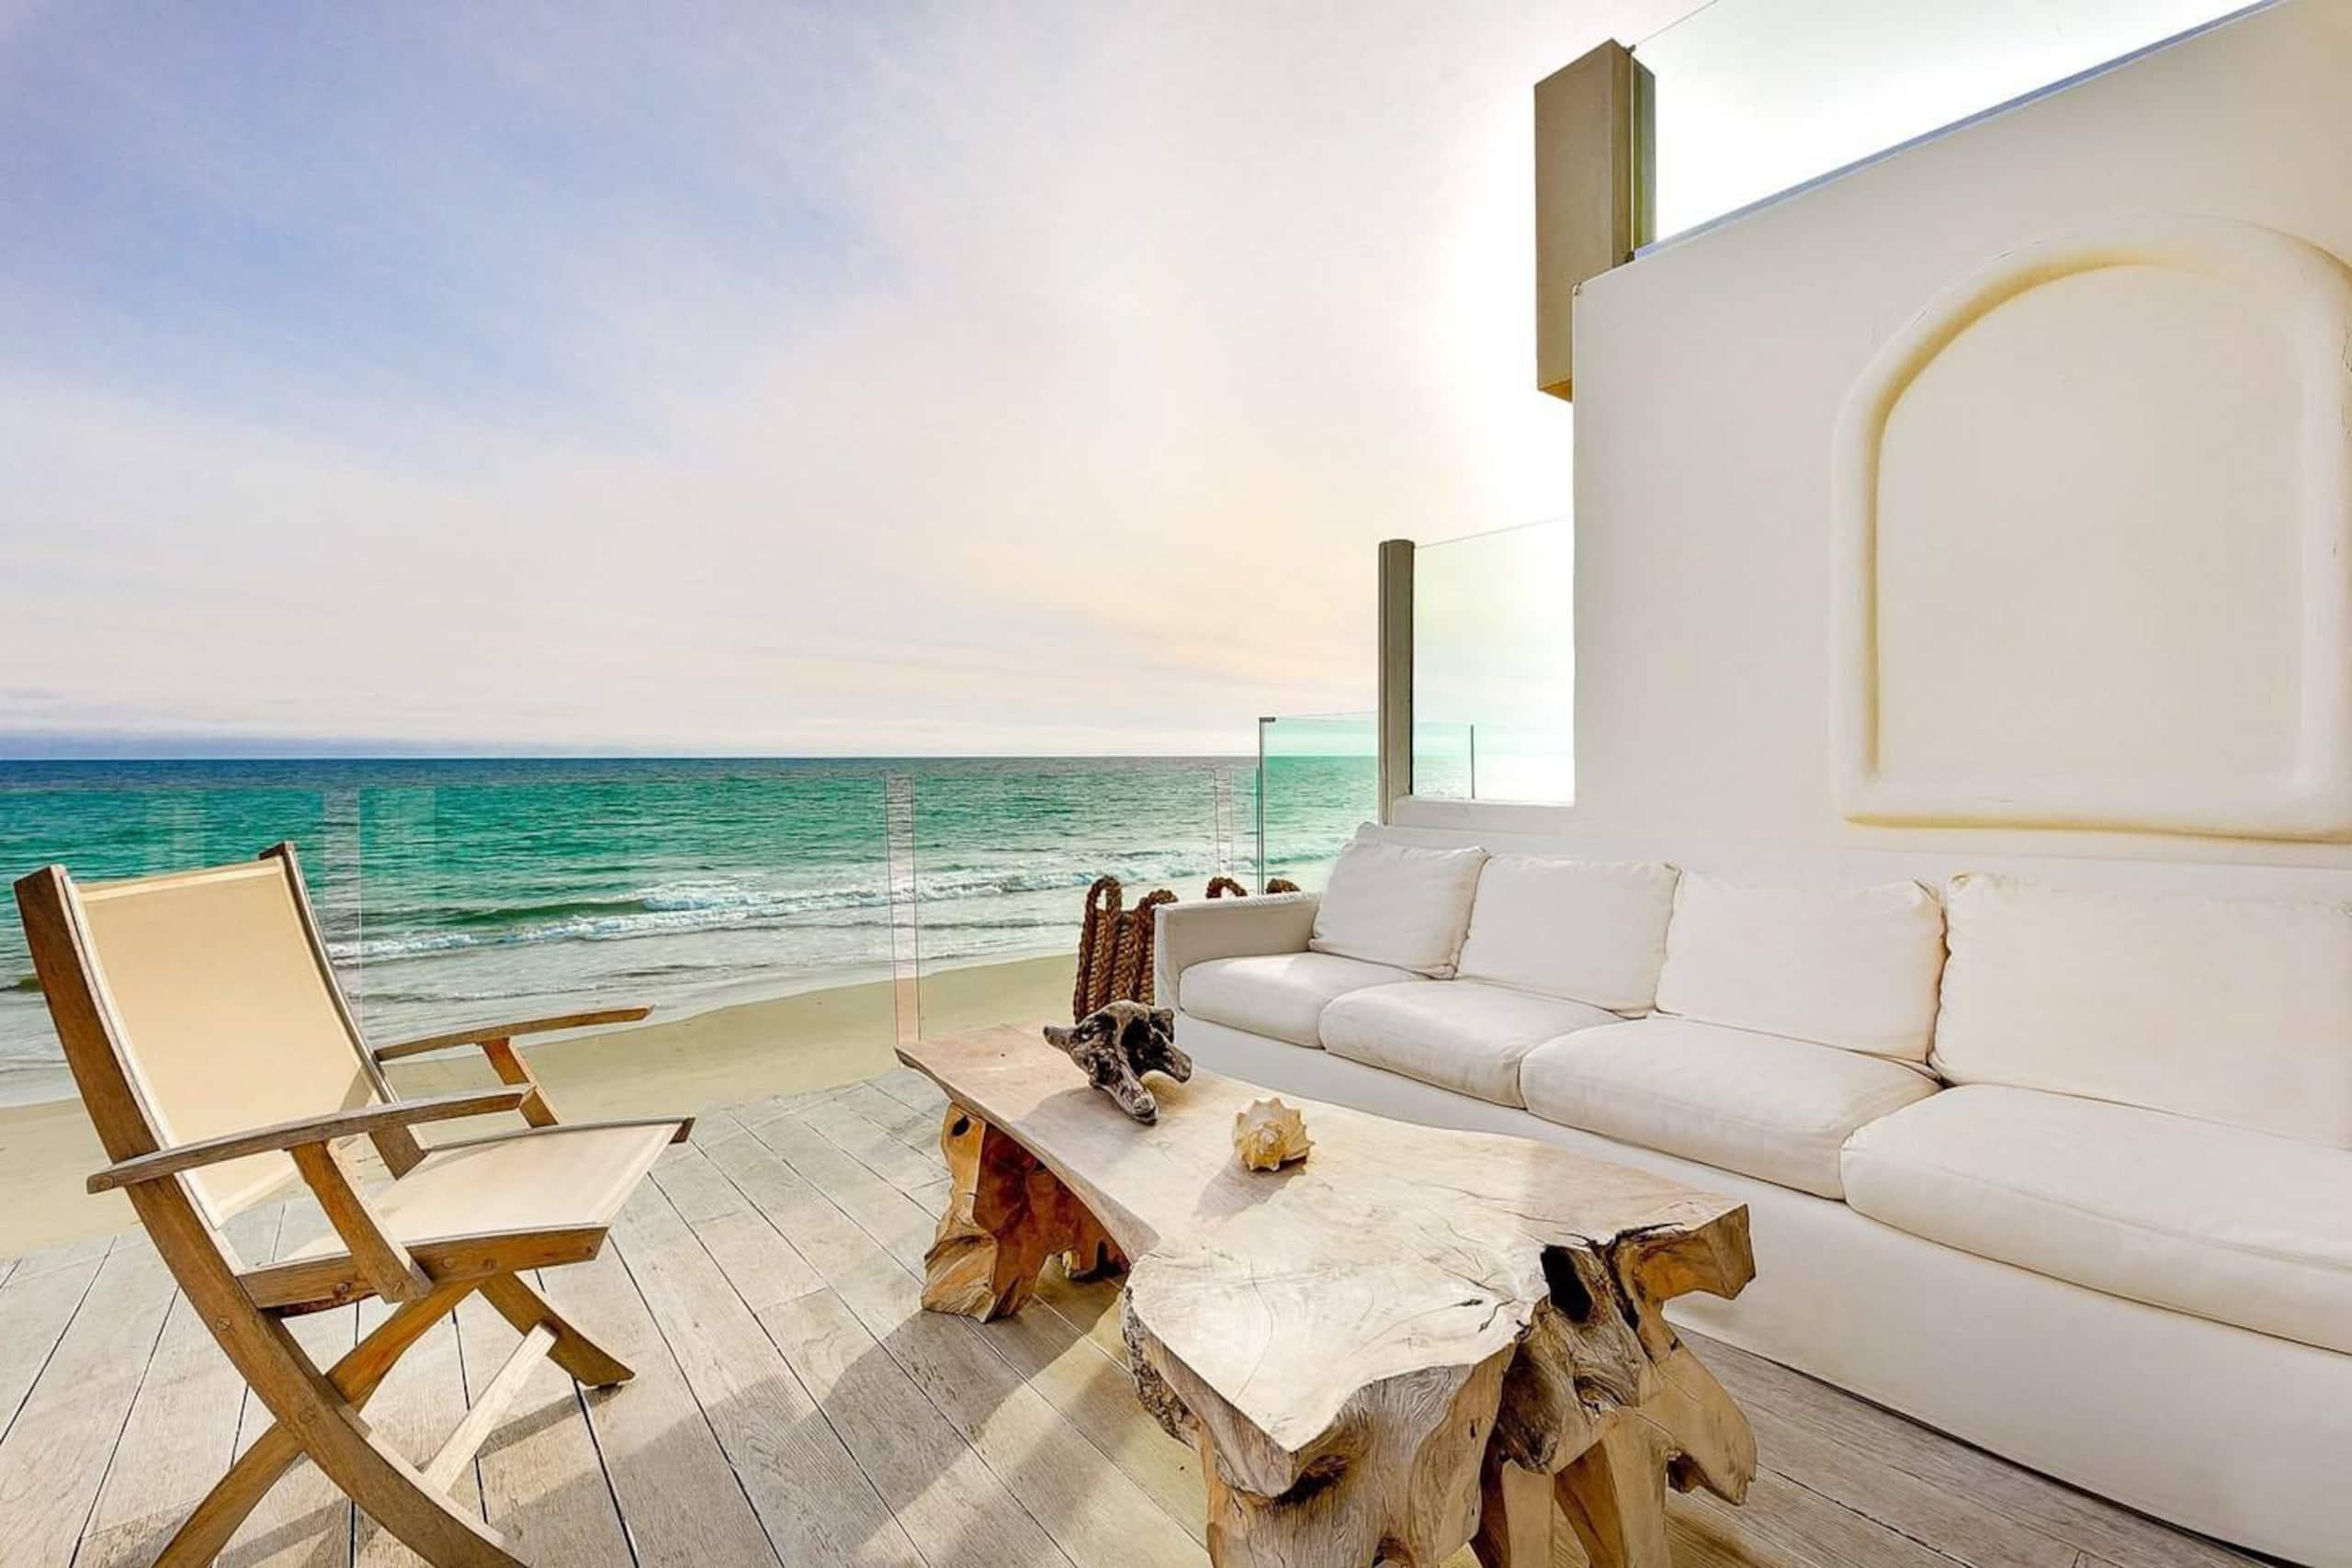 Apartment Villa Shawaiz - Beachfront Villa with 5 beds  photo 20178505